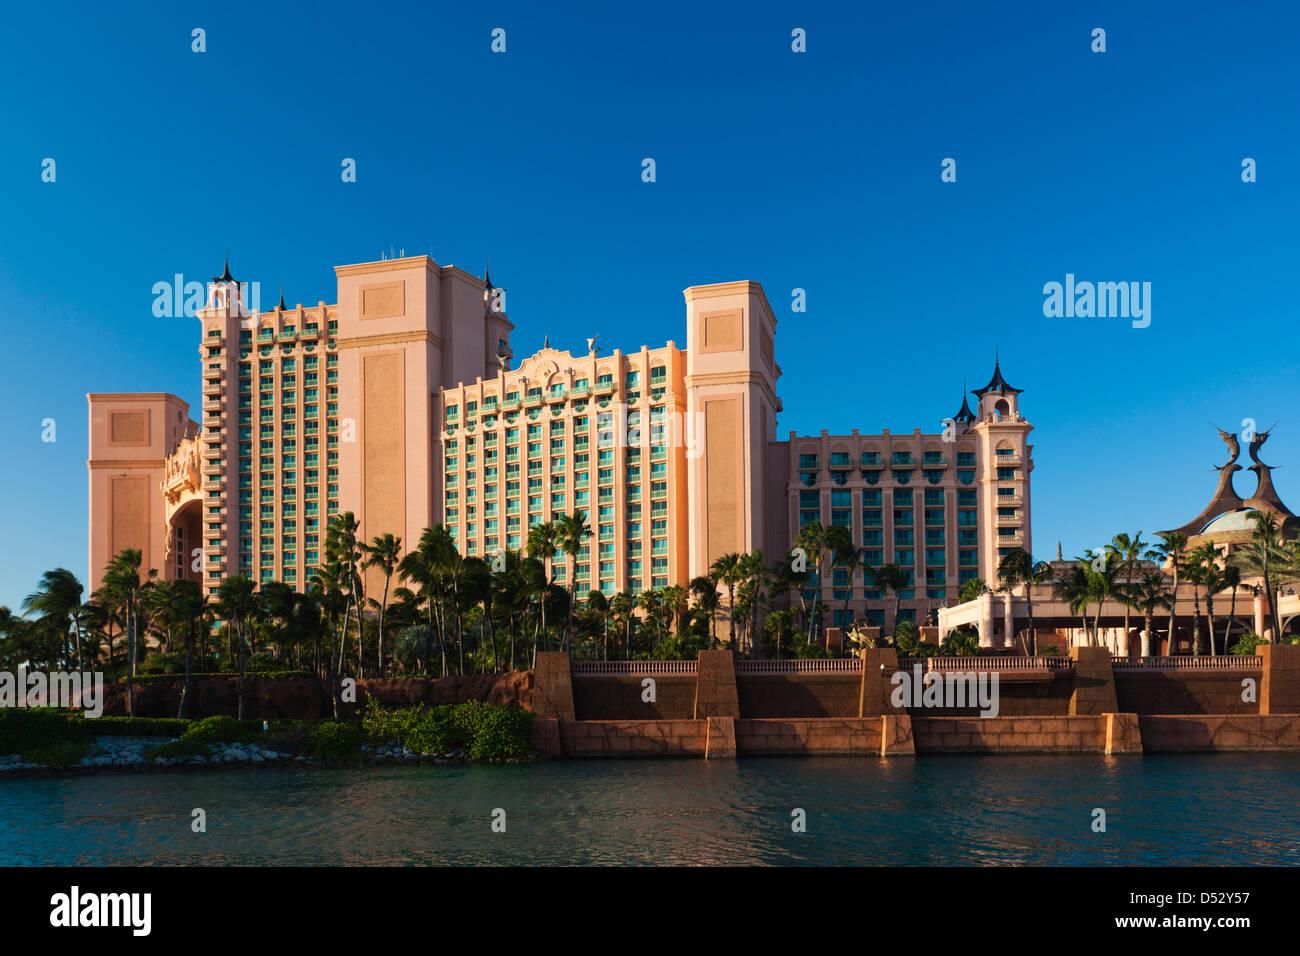 Atlantis Hotel And Casino Paradise Island Bahamas